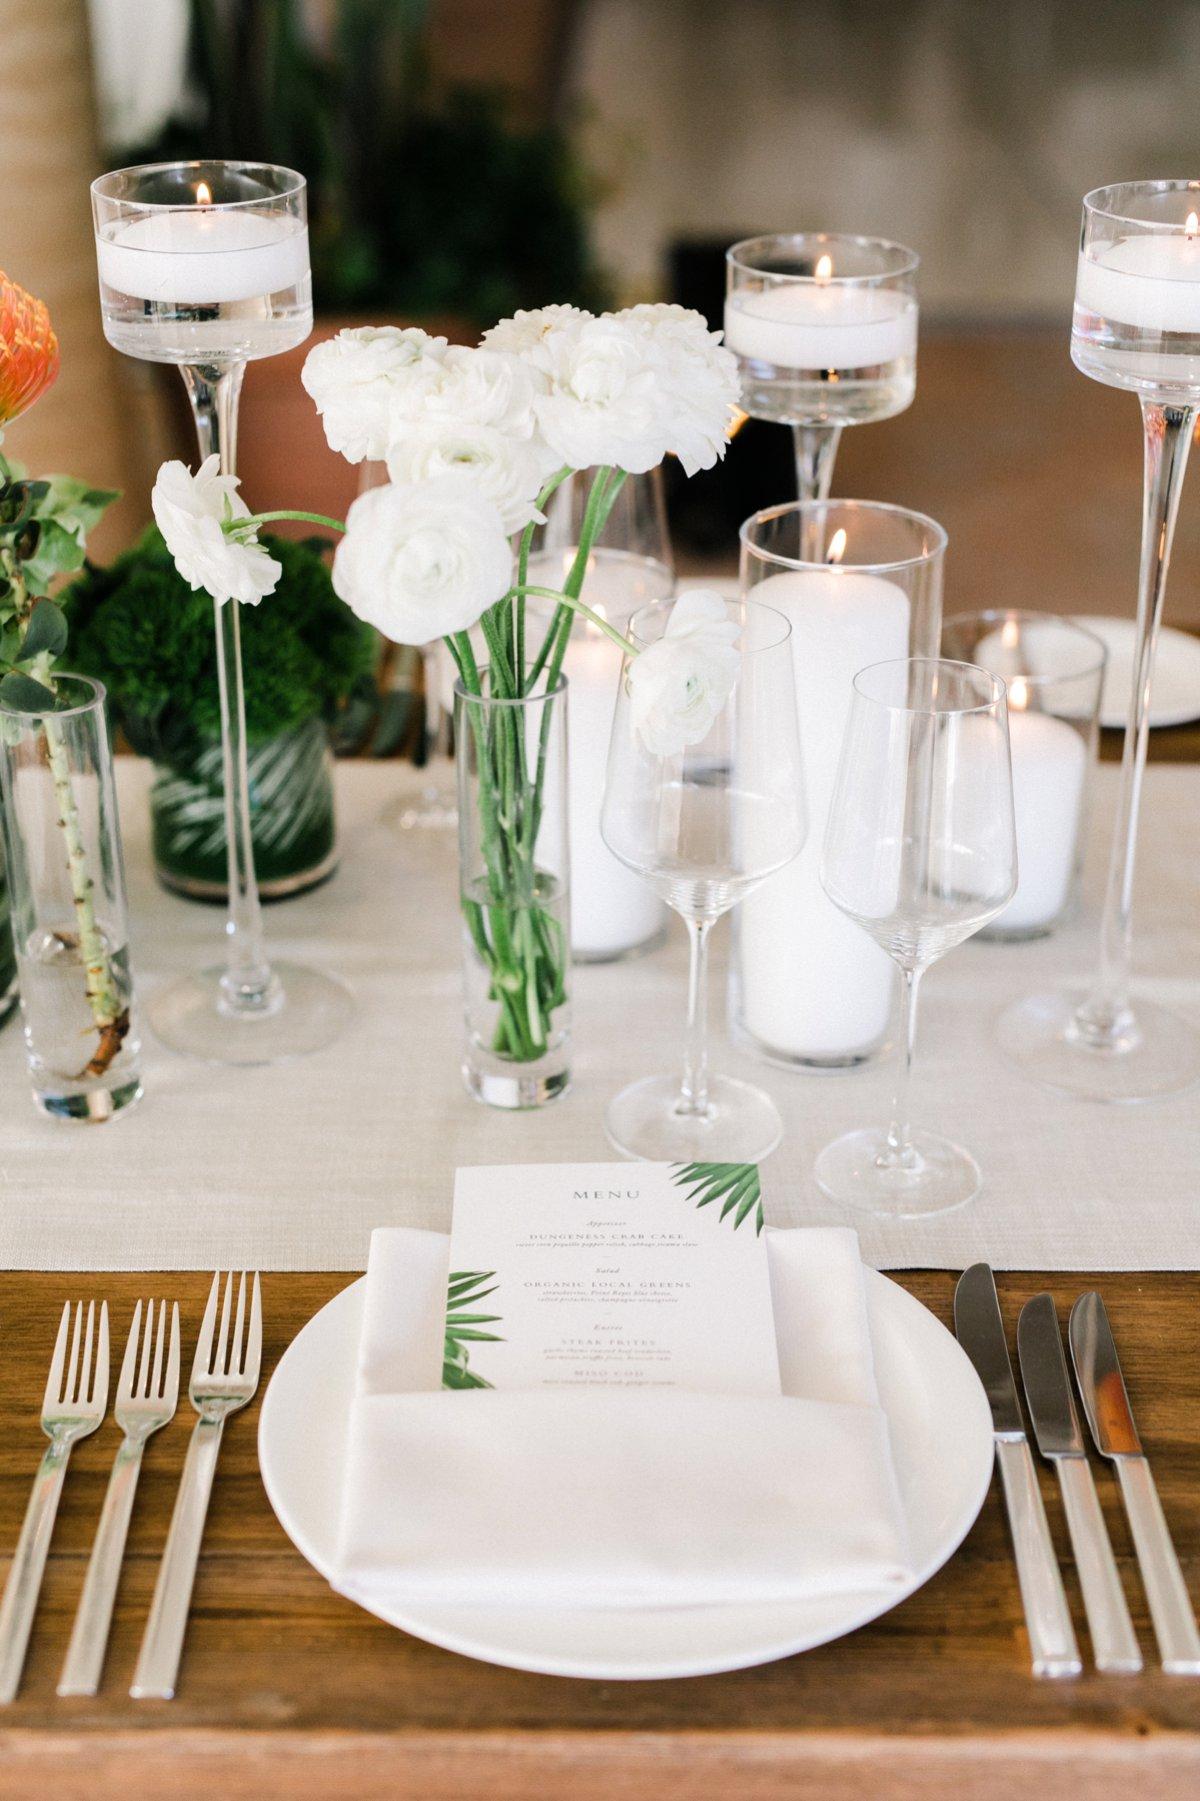 modern wedding reception tablescapes - photo by Anna Delores http://ruffledblog.com/chic-modern-wedding-at-four-seasons-santa-barbara